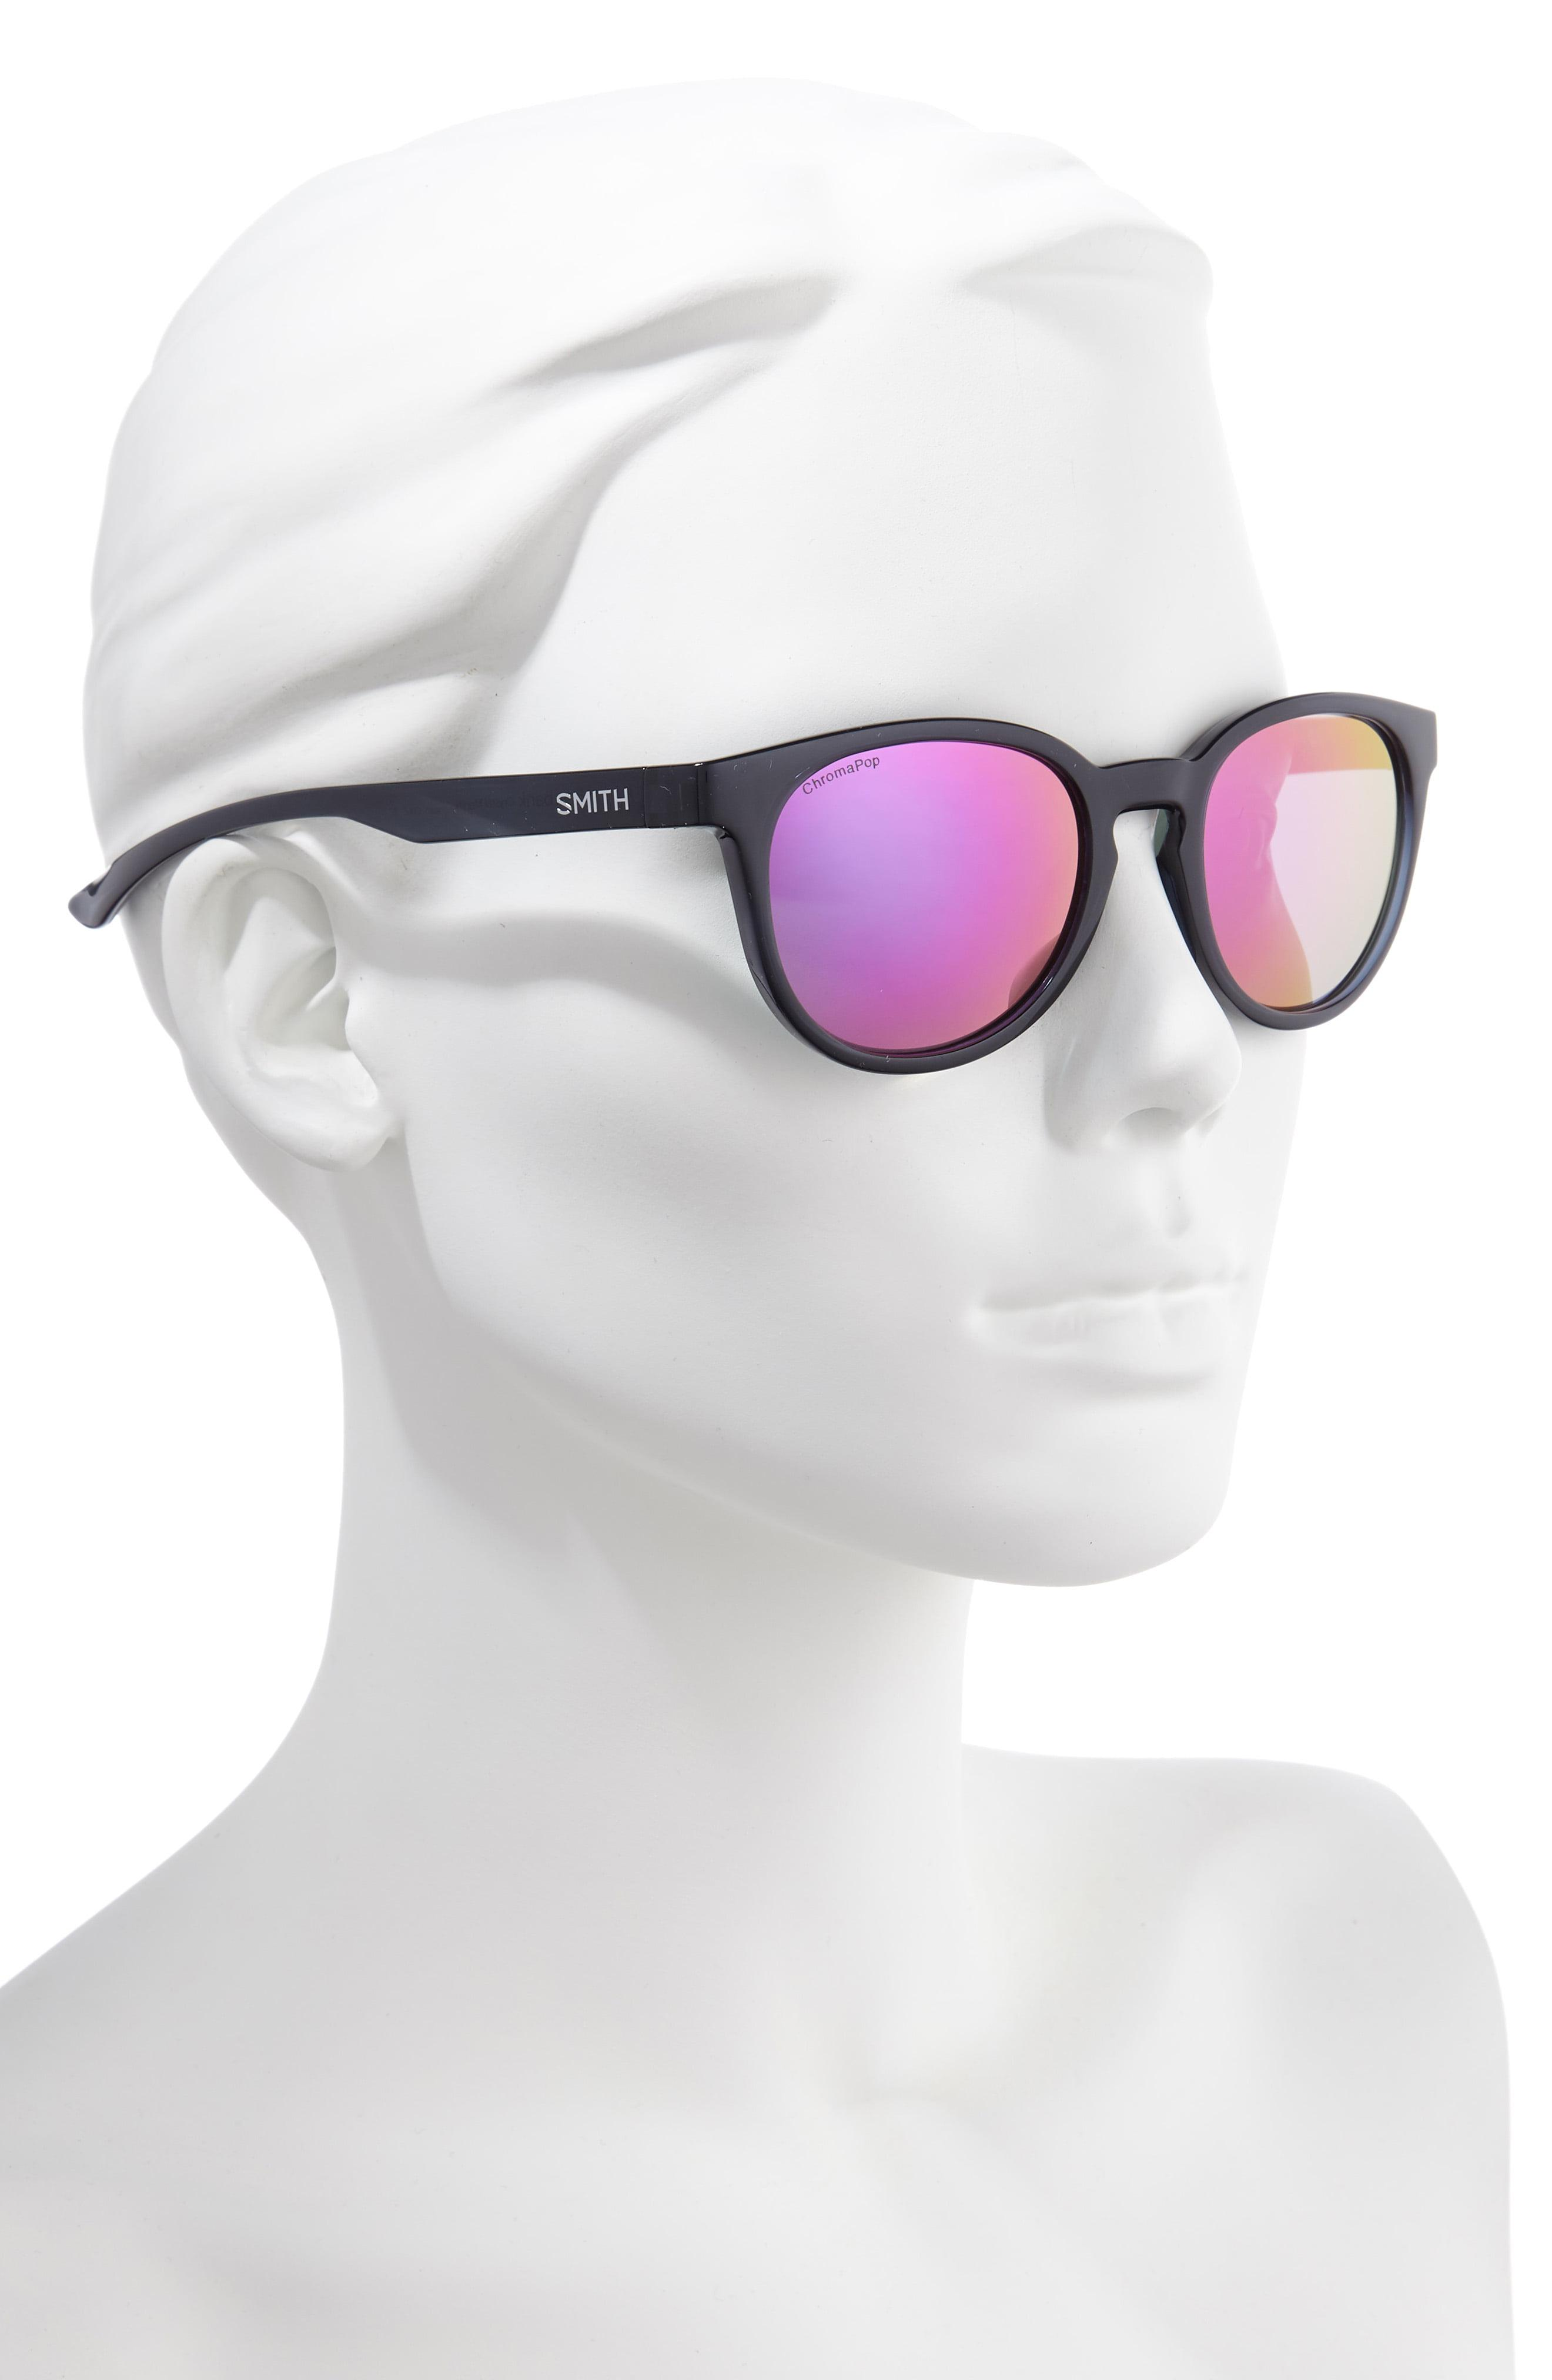 d7a722e880866 Lyst - Smith Eastbank 52mm Chromapoptm Polarized Mirrored Sunglasses -